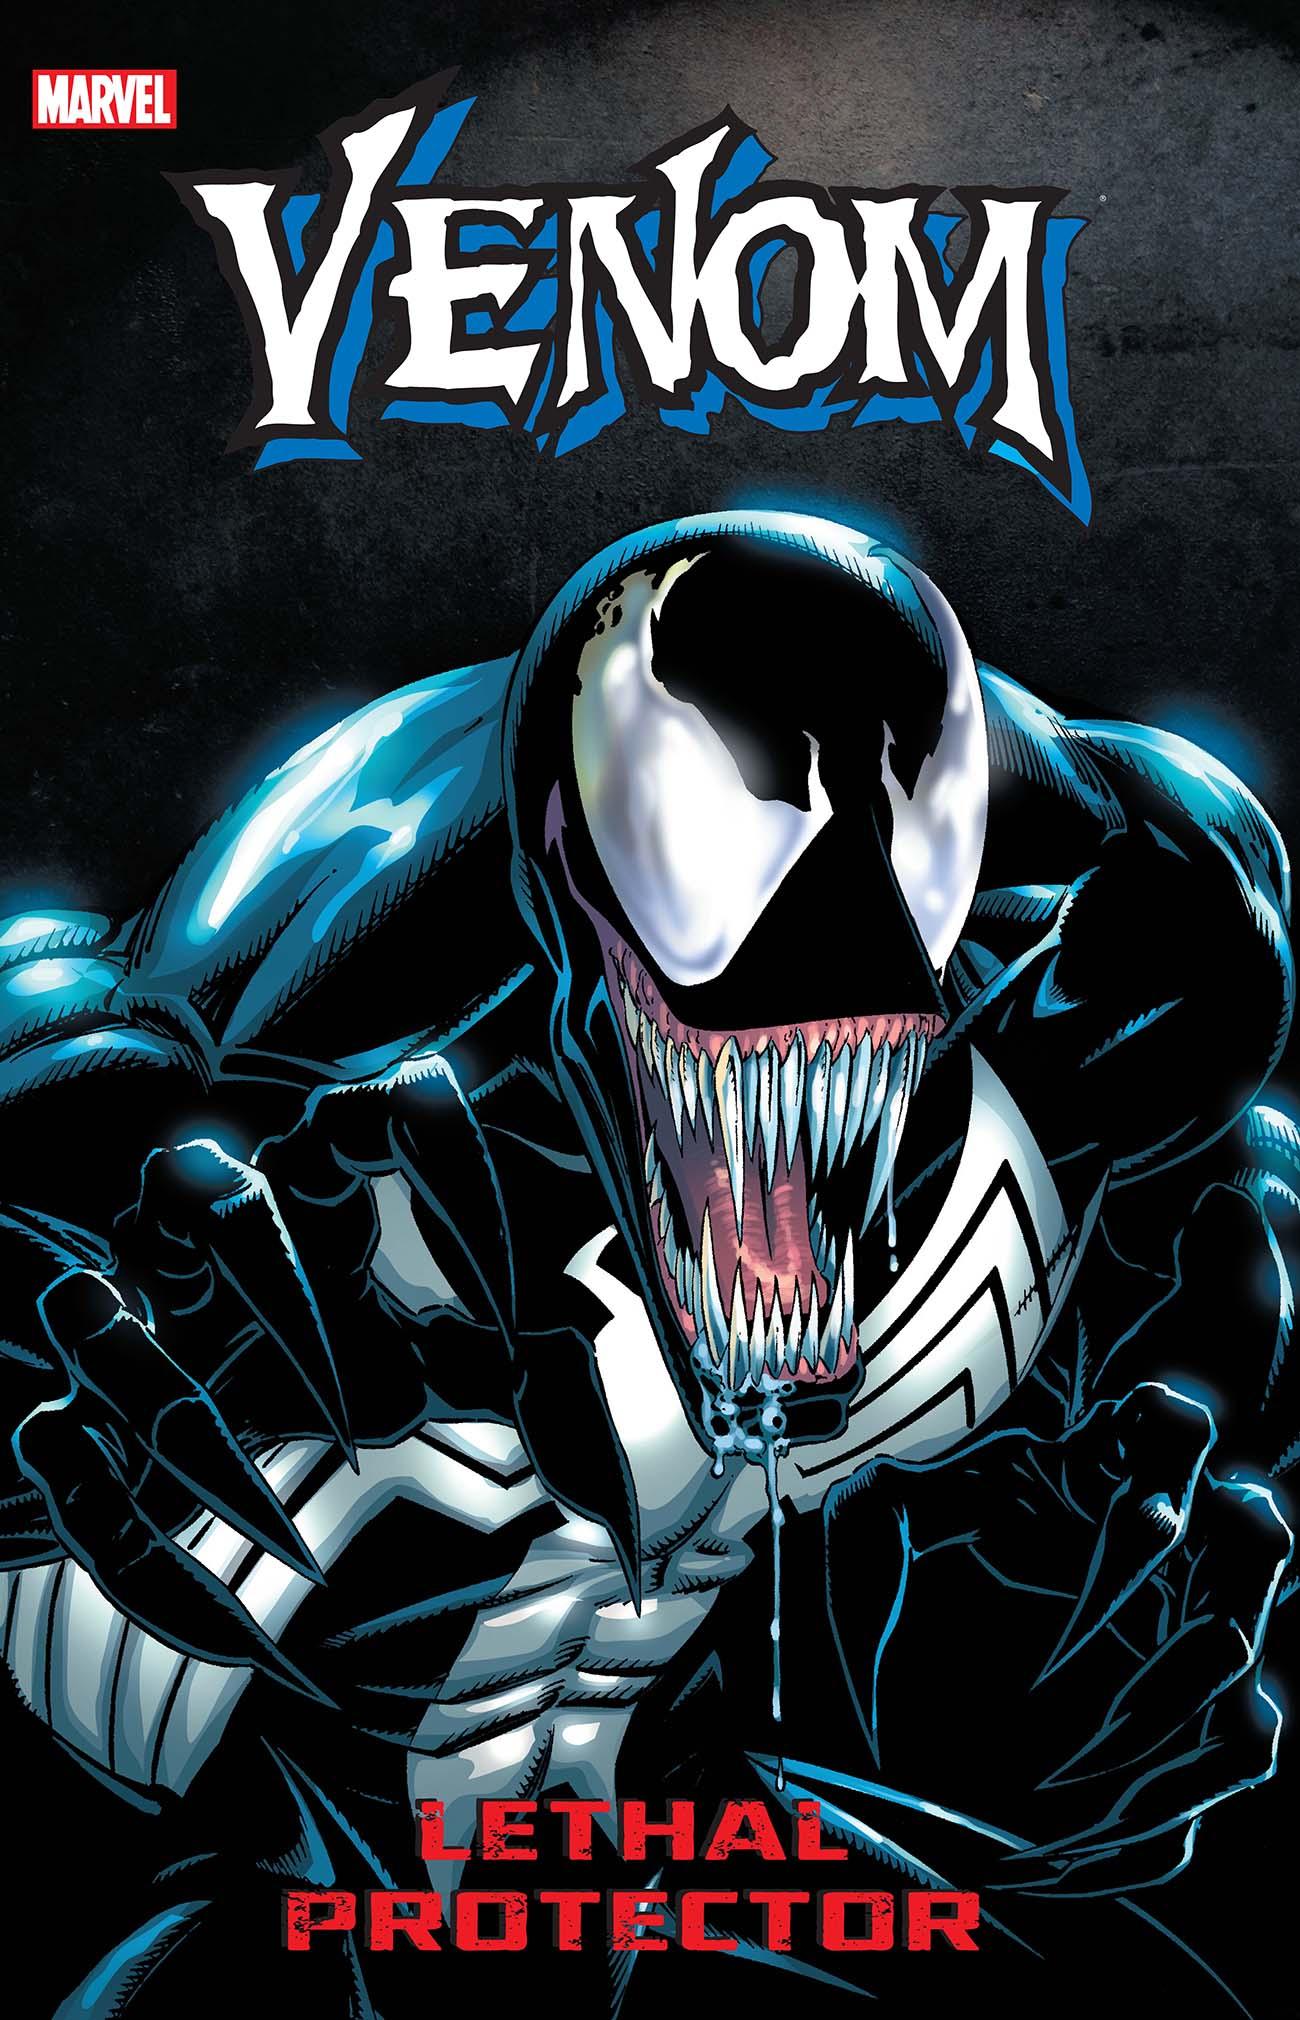 Venom: Lethal Protector (Trade Paperback)